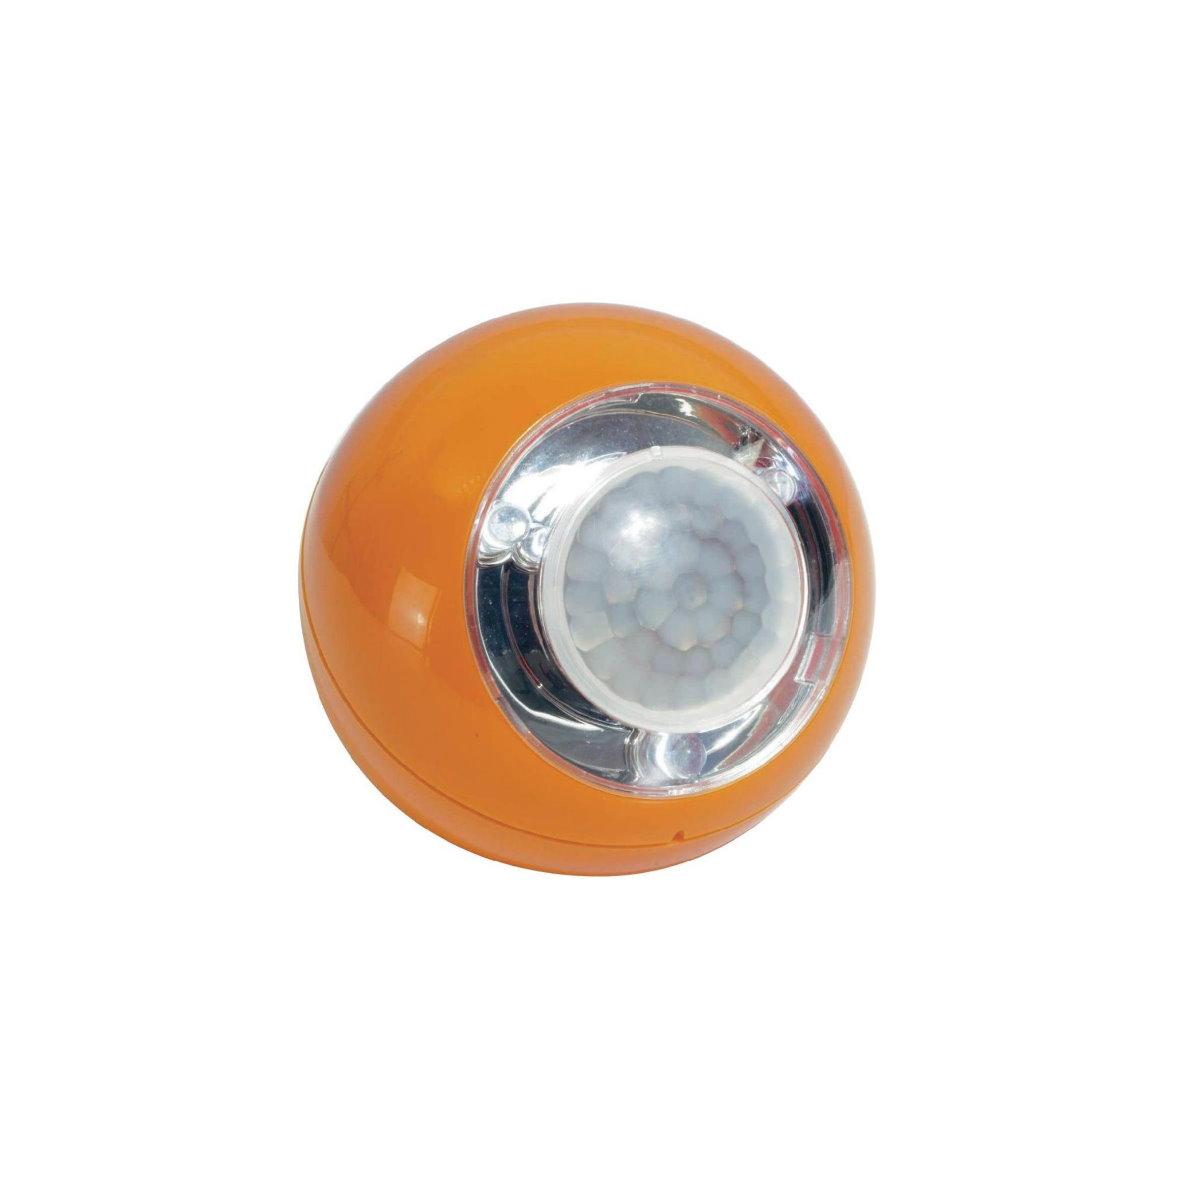 gev led lichtball licht ball lampe bewegungsmelder sensor magnet batterie tisch ebay. Black Bedroom Furniture Sets. Home Design Ideas